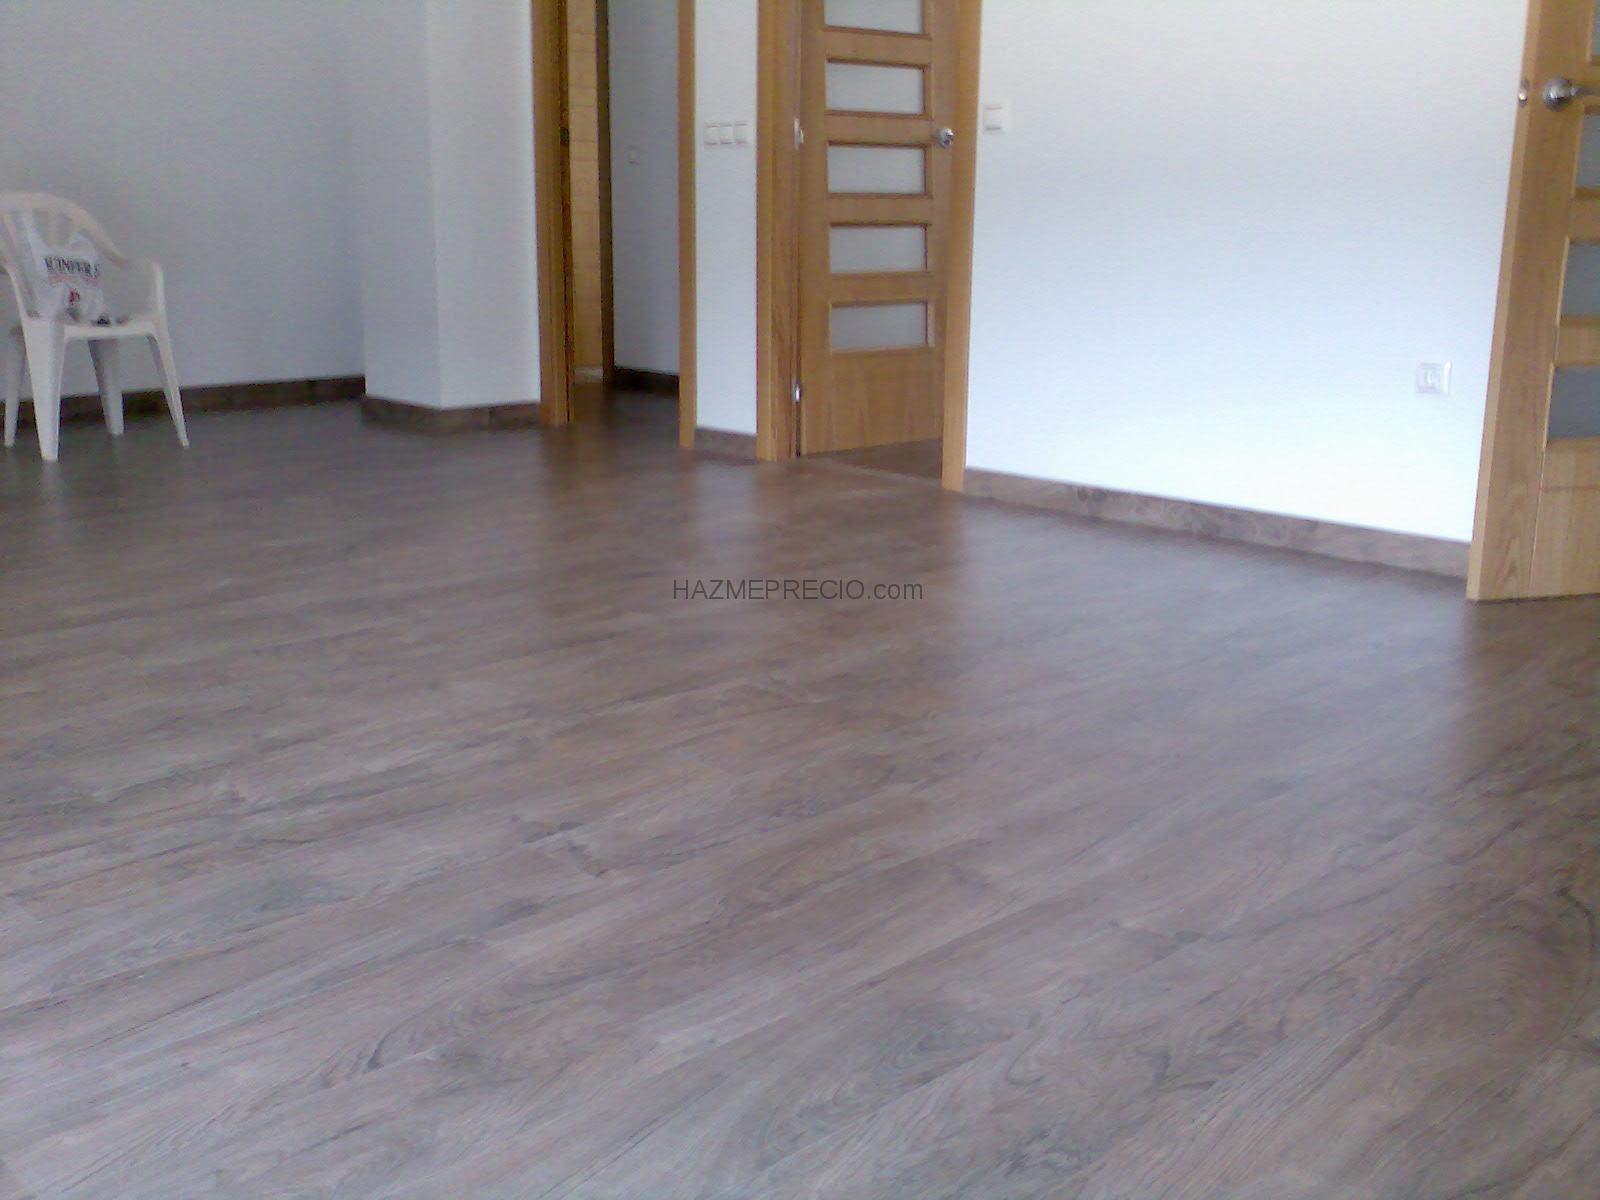 Muebles para tarima gris - Tarima gris ...